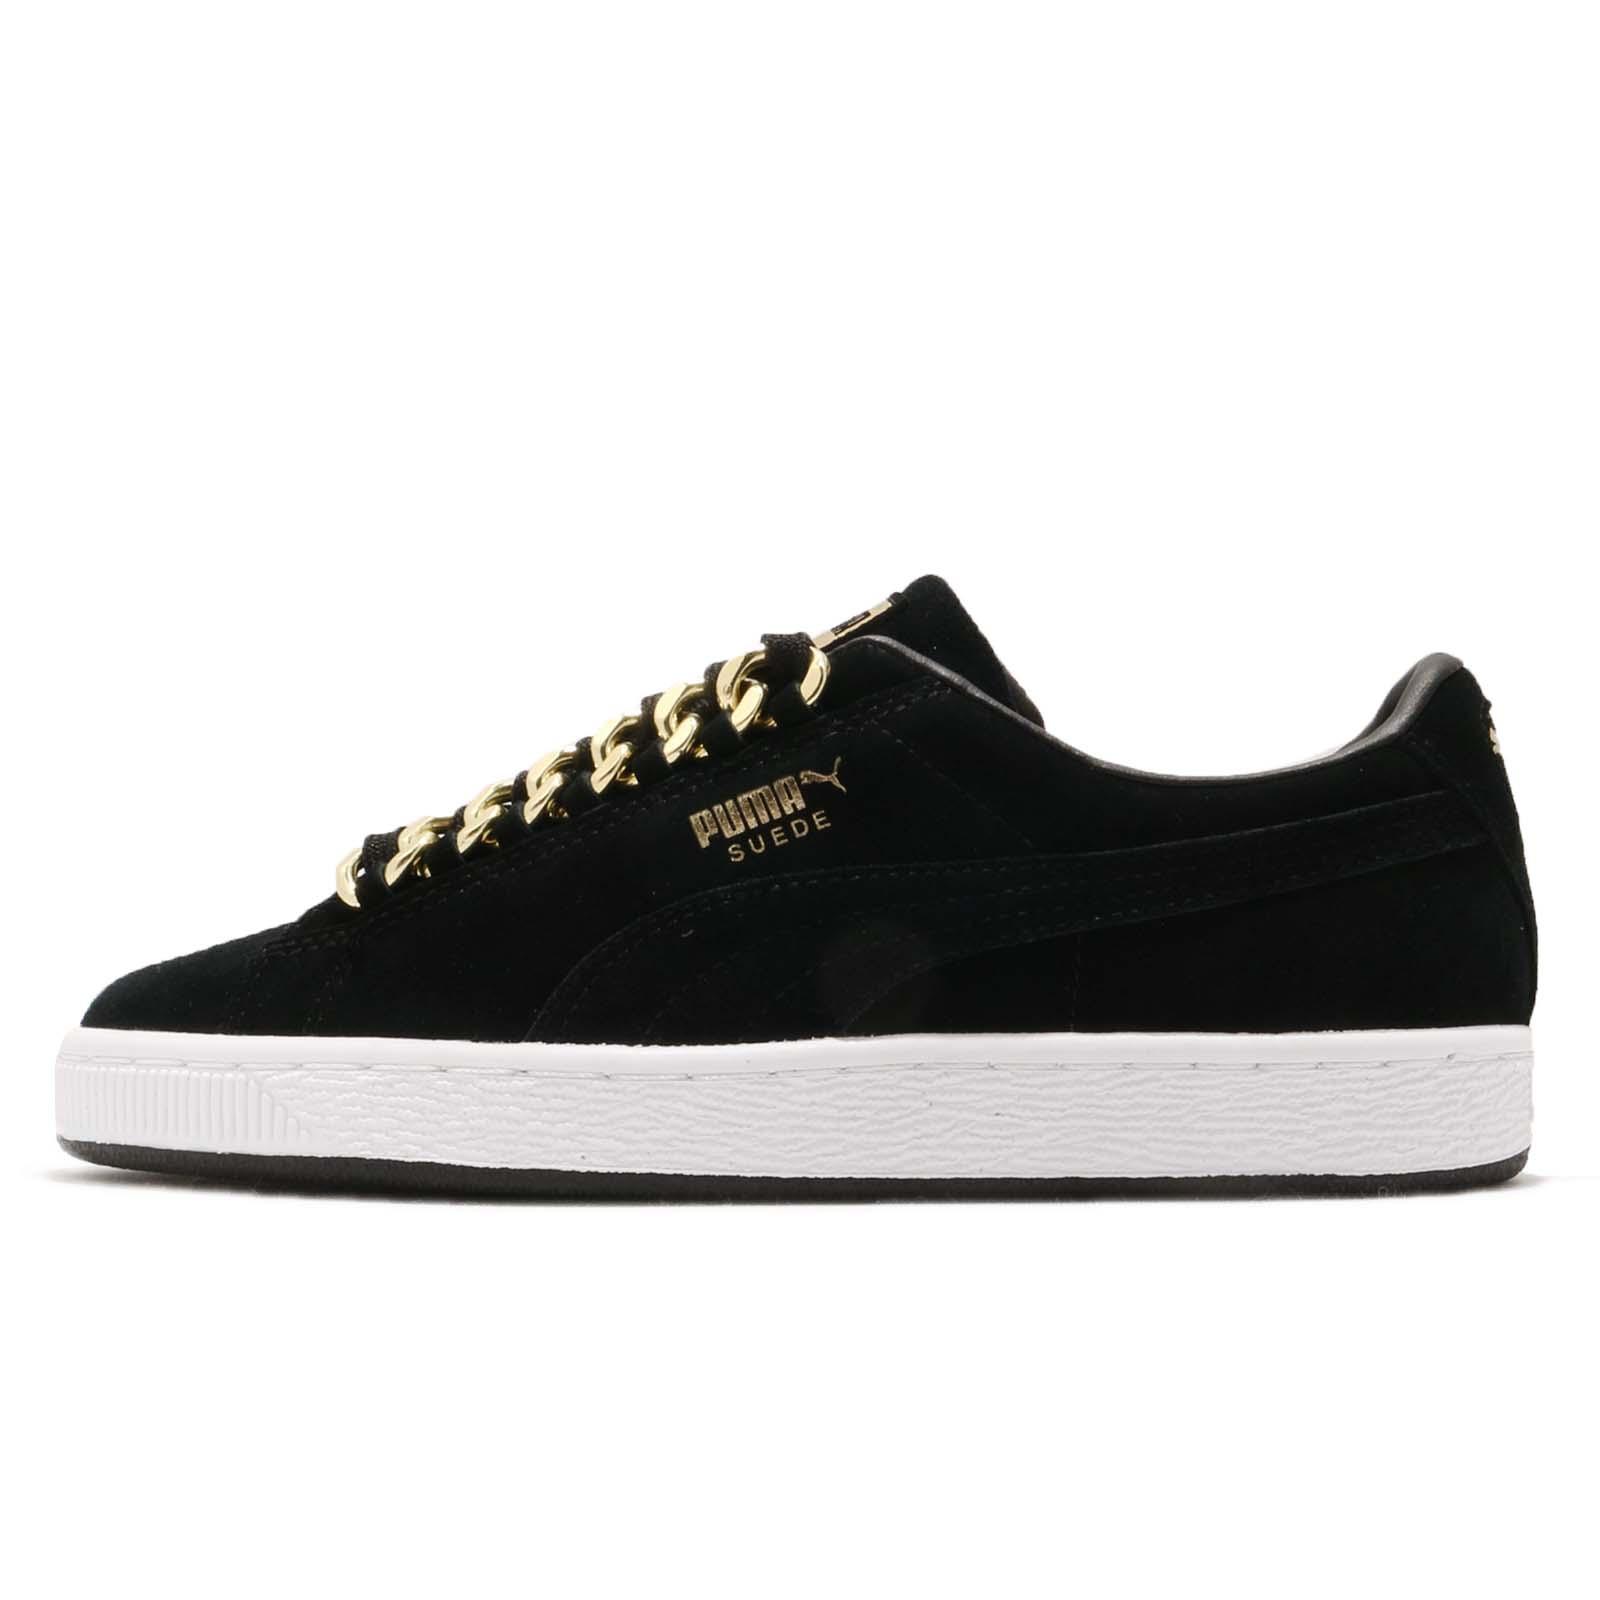 Puma 休閒鞋 Suede Classic x Chain 黑 金 男鞋 麂皮 金標 【ACS】 36739103